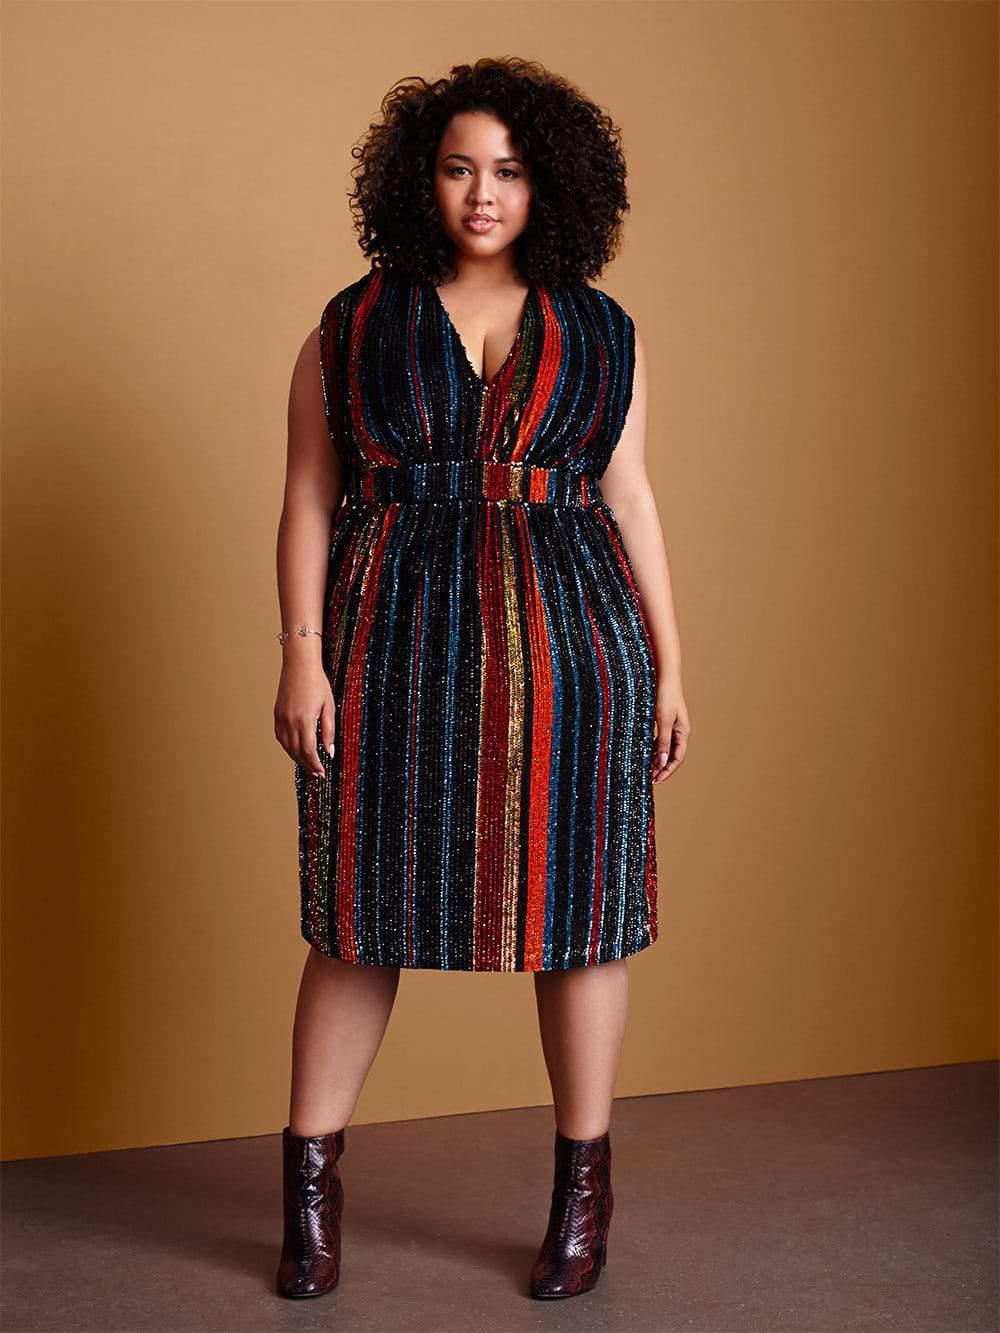 Gabi Fresh Slays in the ASOS Curve Fall Look Book on The Curvy Fashionista